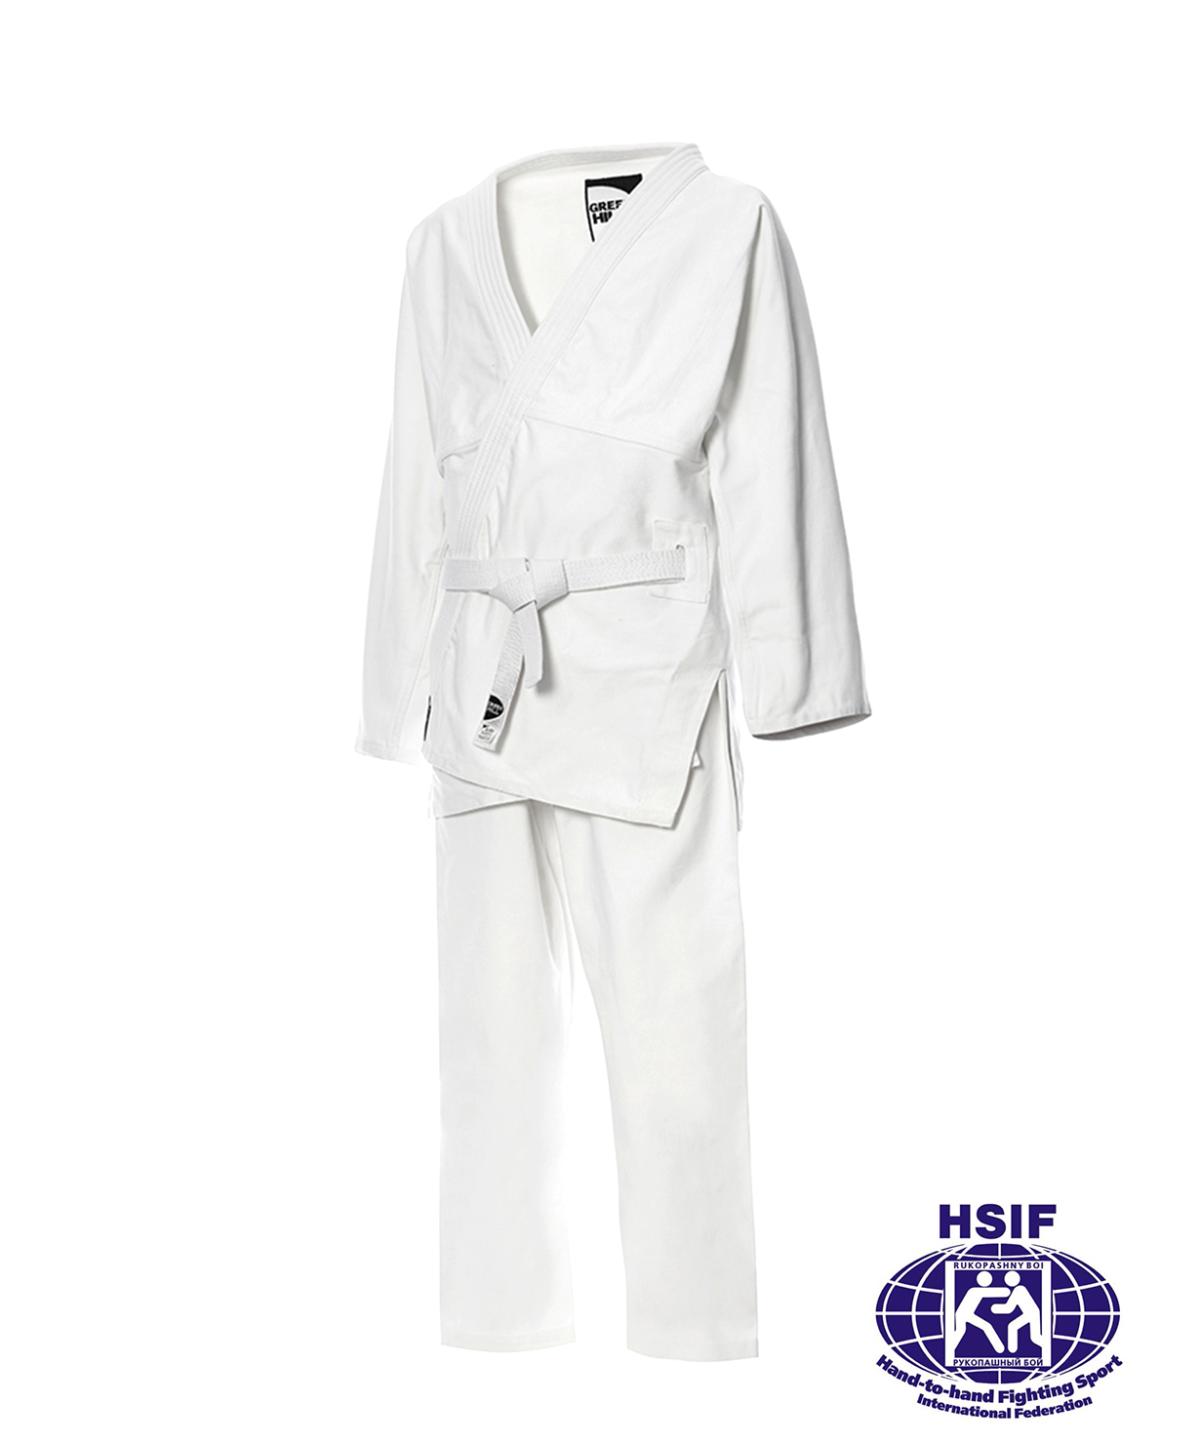 GREEN HILL Кимоно для рукопашного боя р.3/160 Junior  SHH-2210 - 1